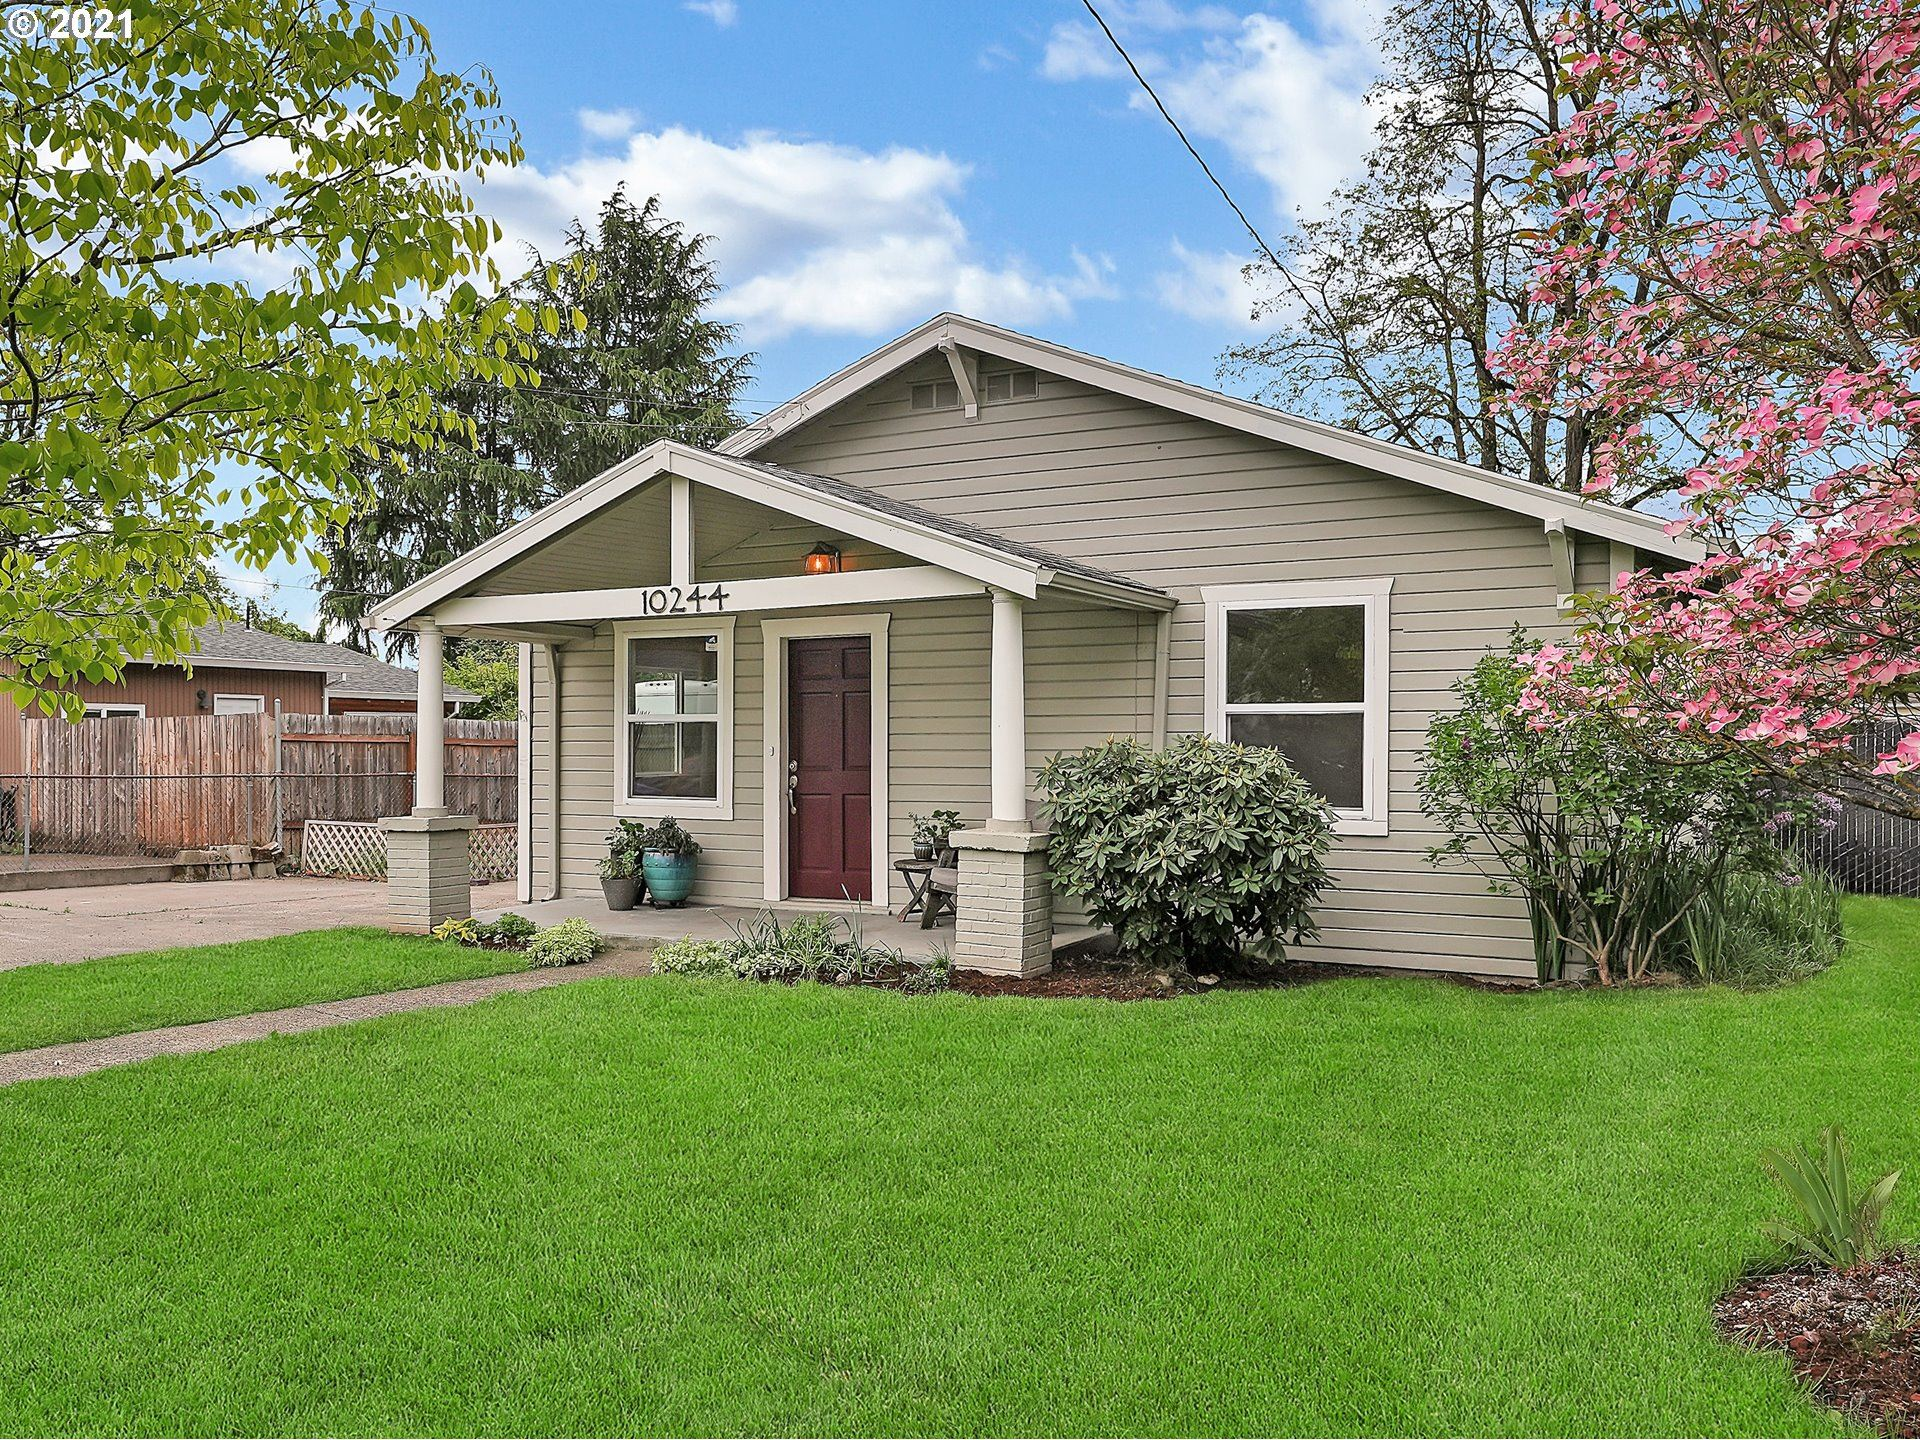 10244 SE MITCHELL ST, Portland, OR 97266 - MLS#: 21569624